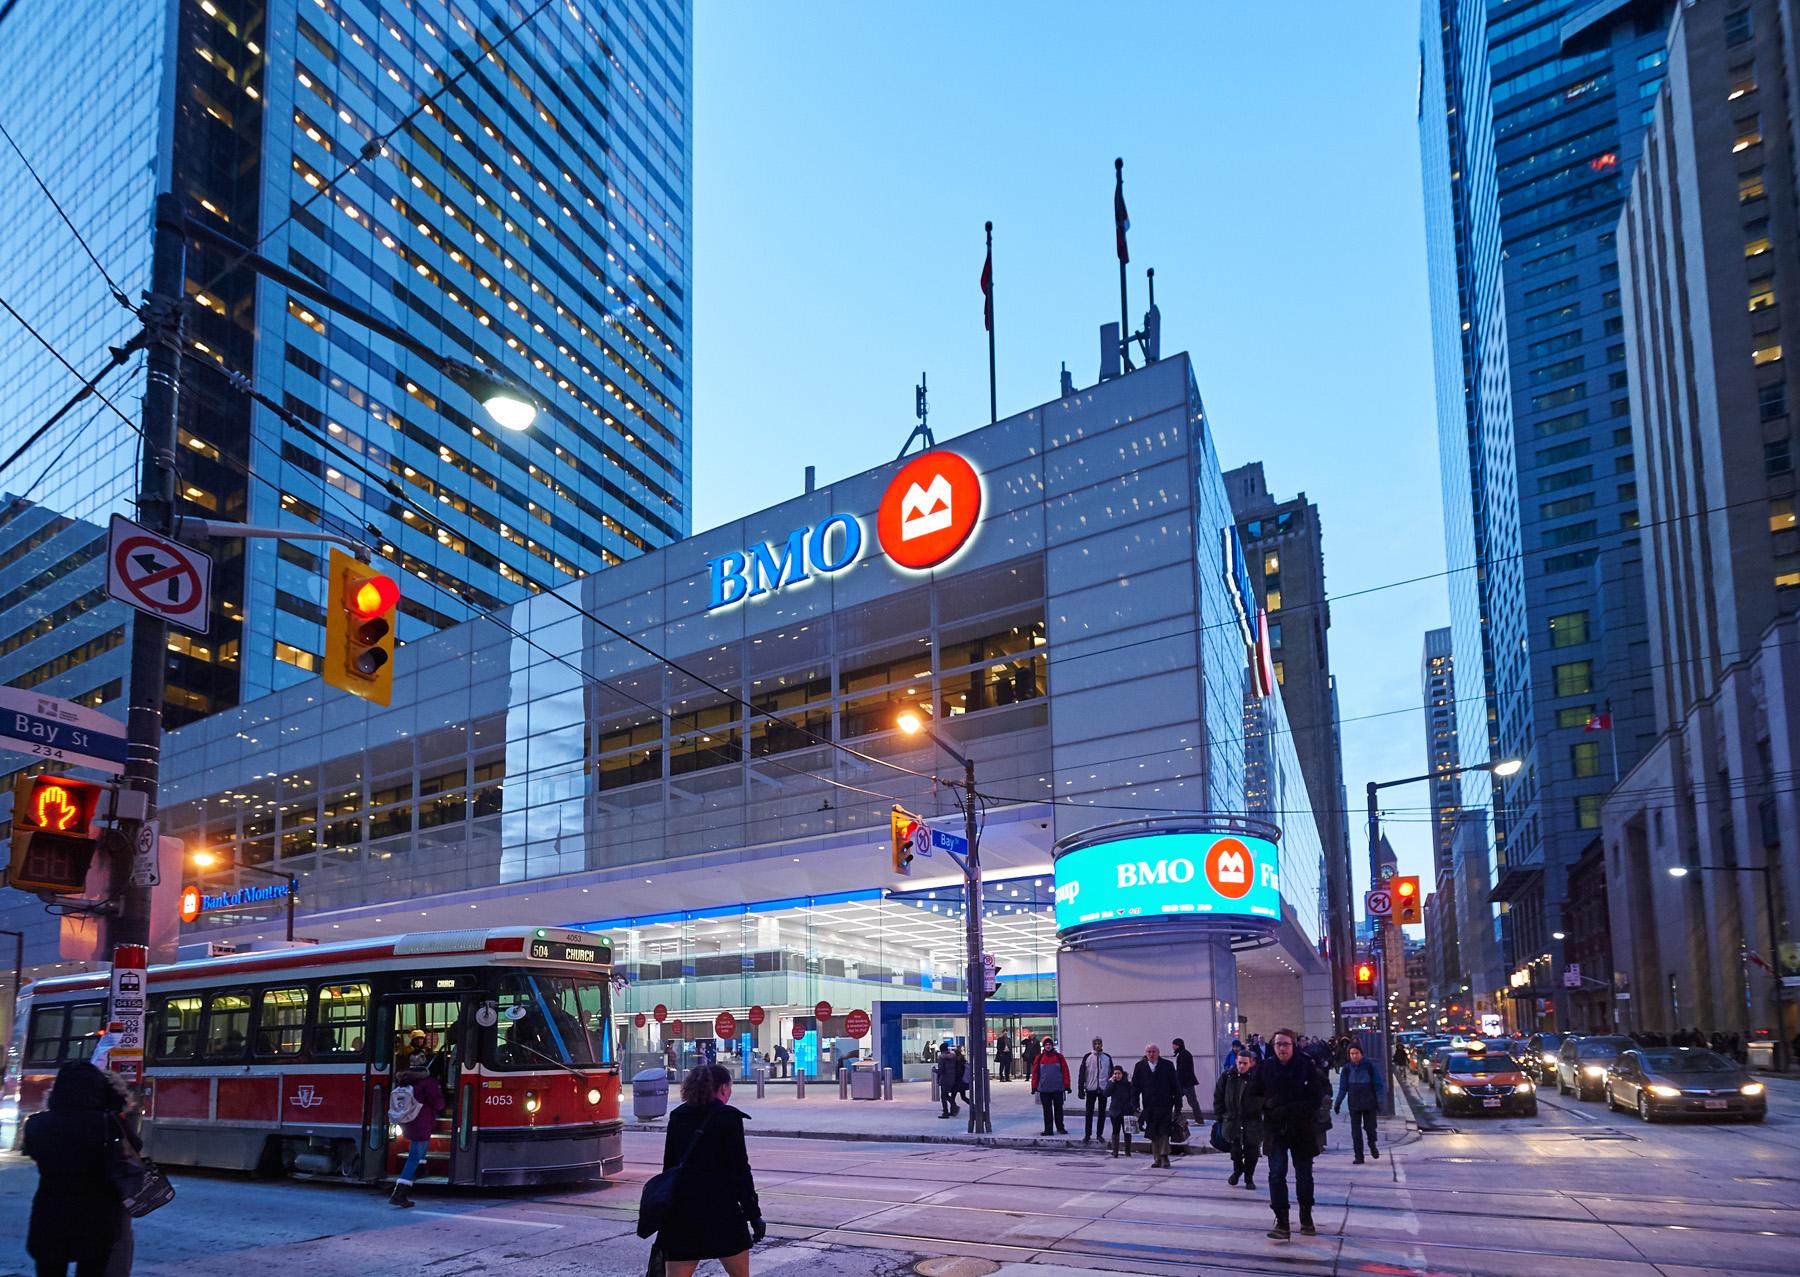 BMO exterior, downtown Toronto